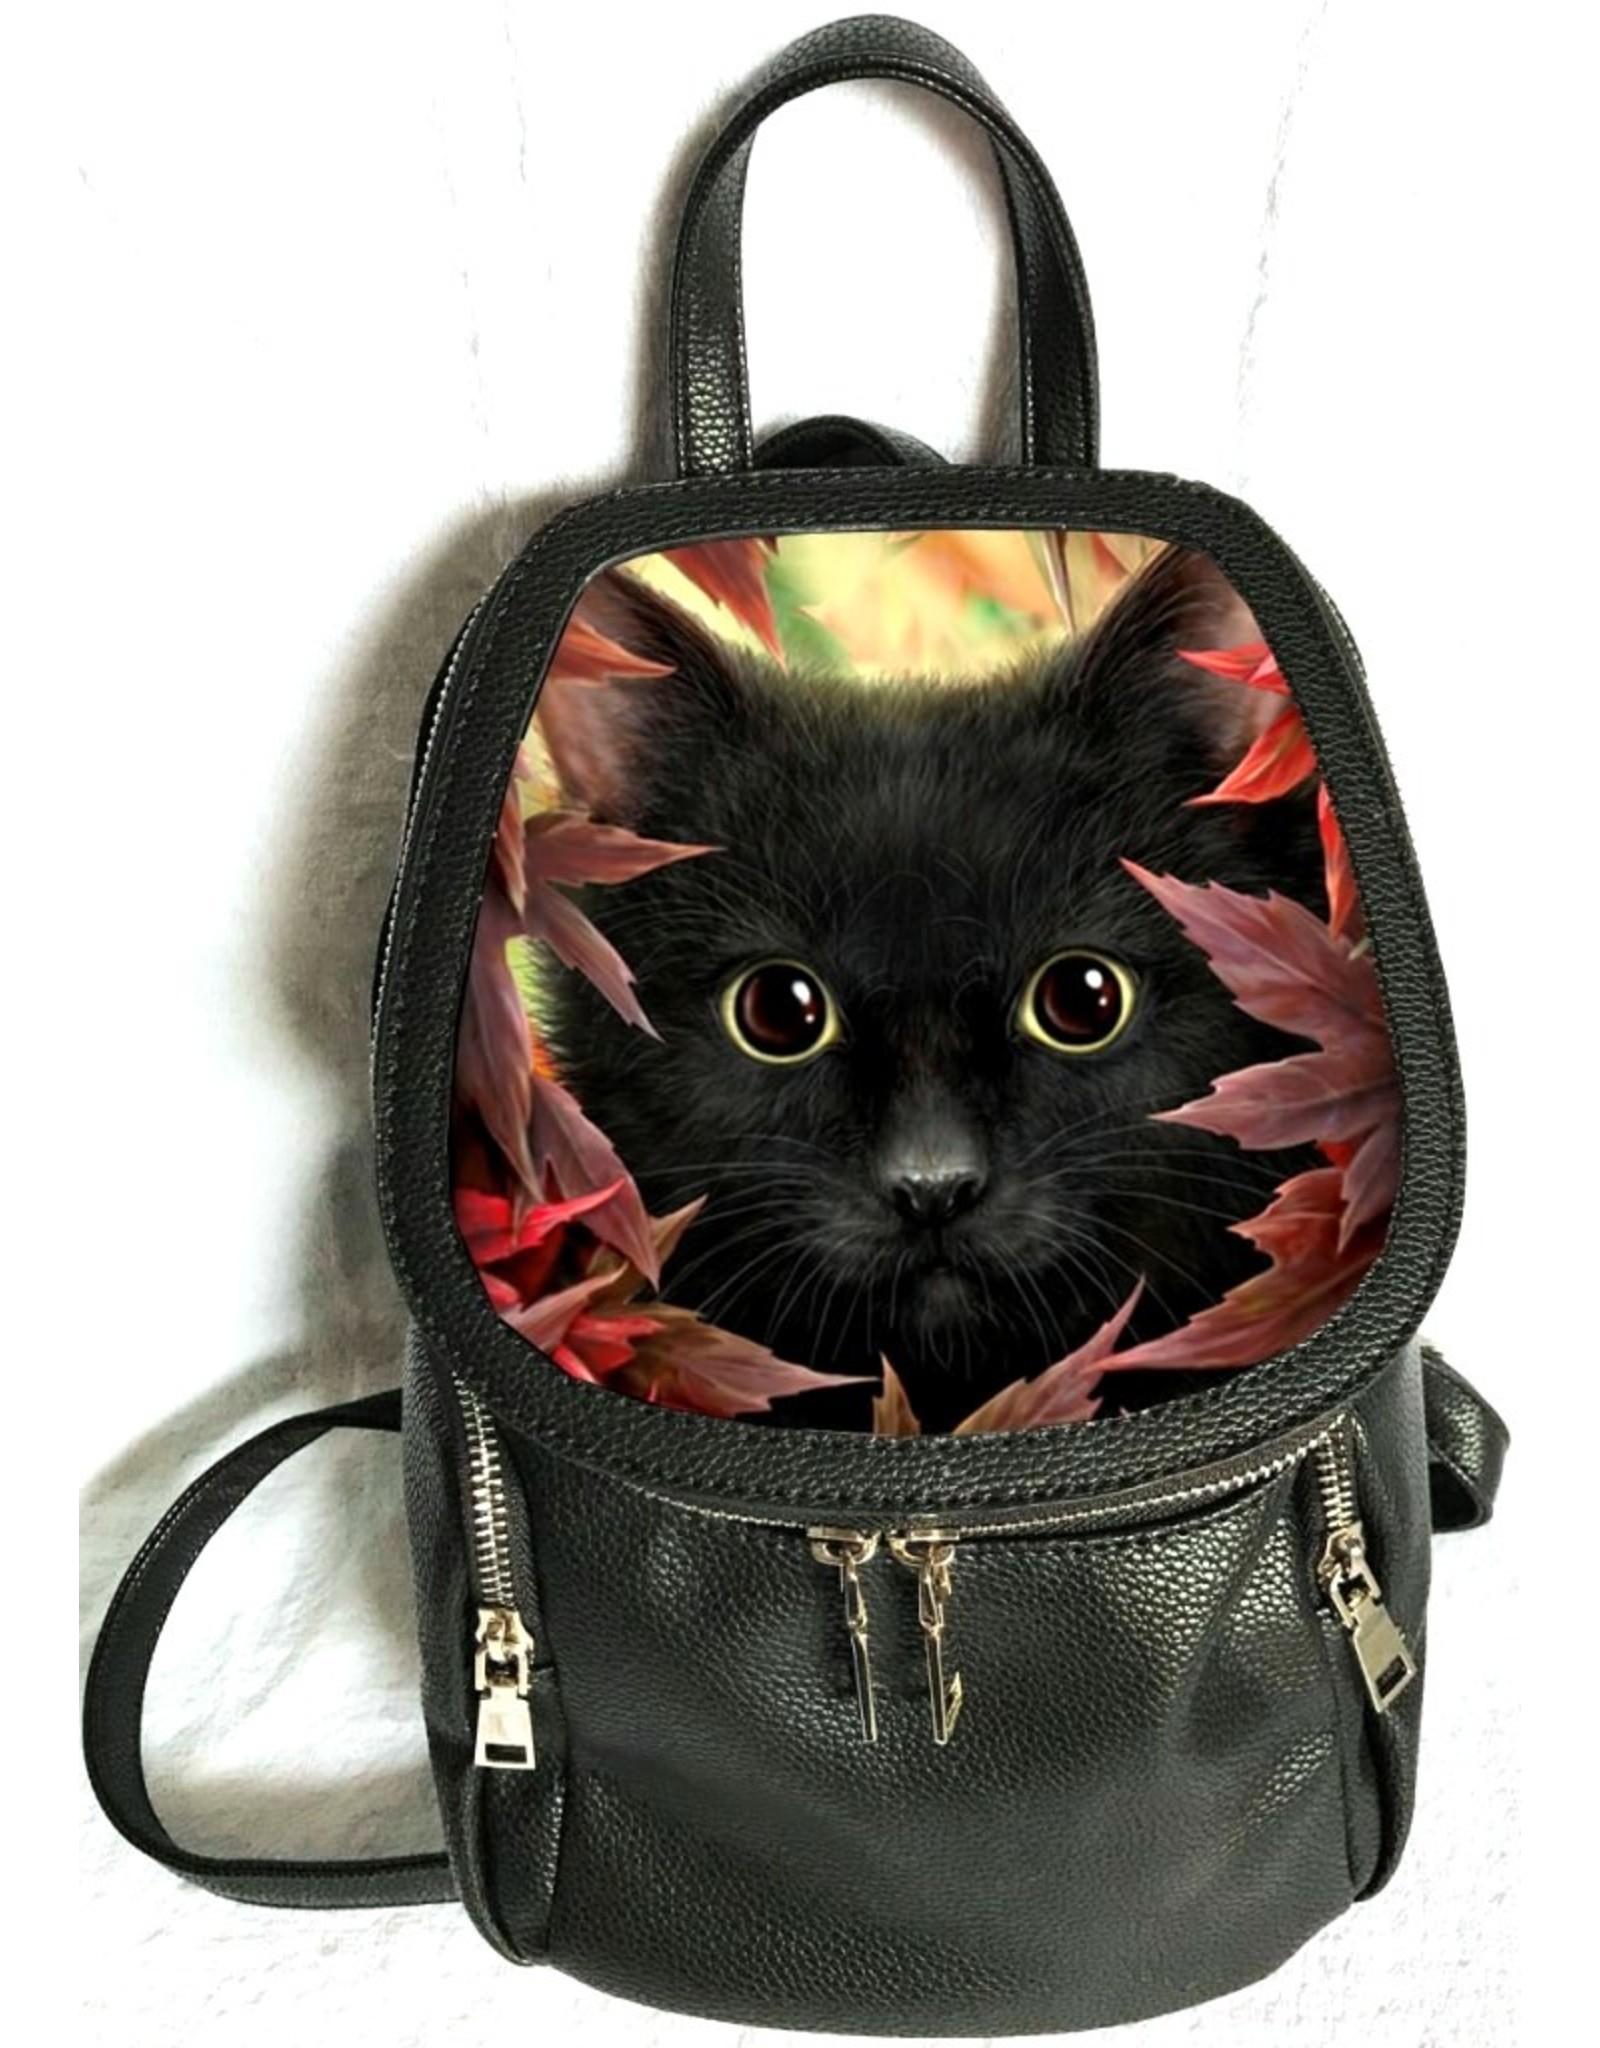 SheBlackDragon 3D Bags and Backpacks - Linda M. Jones Autumn Cat Backpack 3D